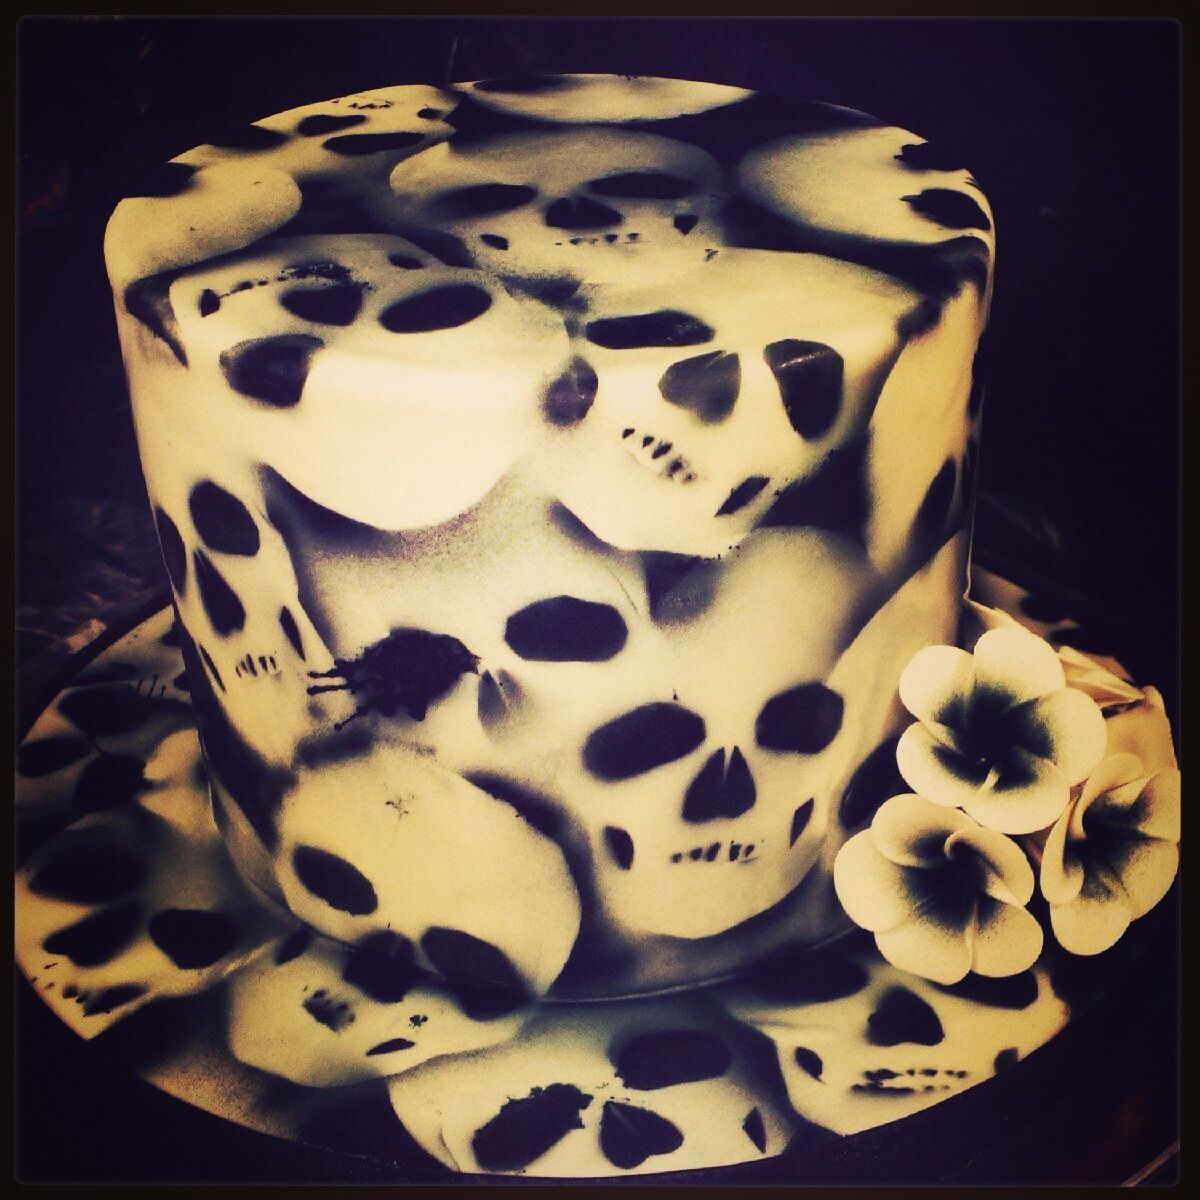 Tremendous Skull Birthday Cake With Images Cupcake Birthday Cake Skull Funny Birthday Cards Online Barepcheapnameinfo